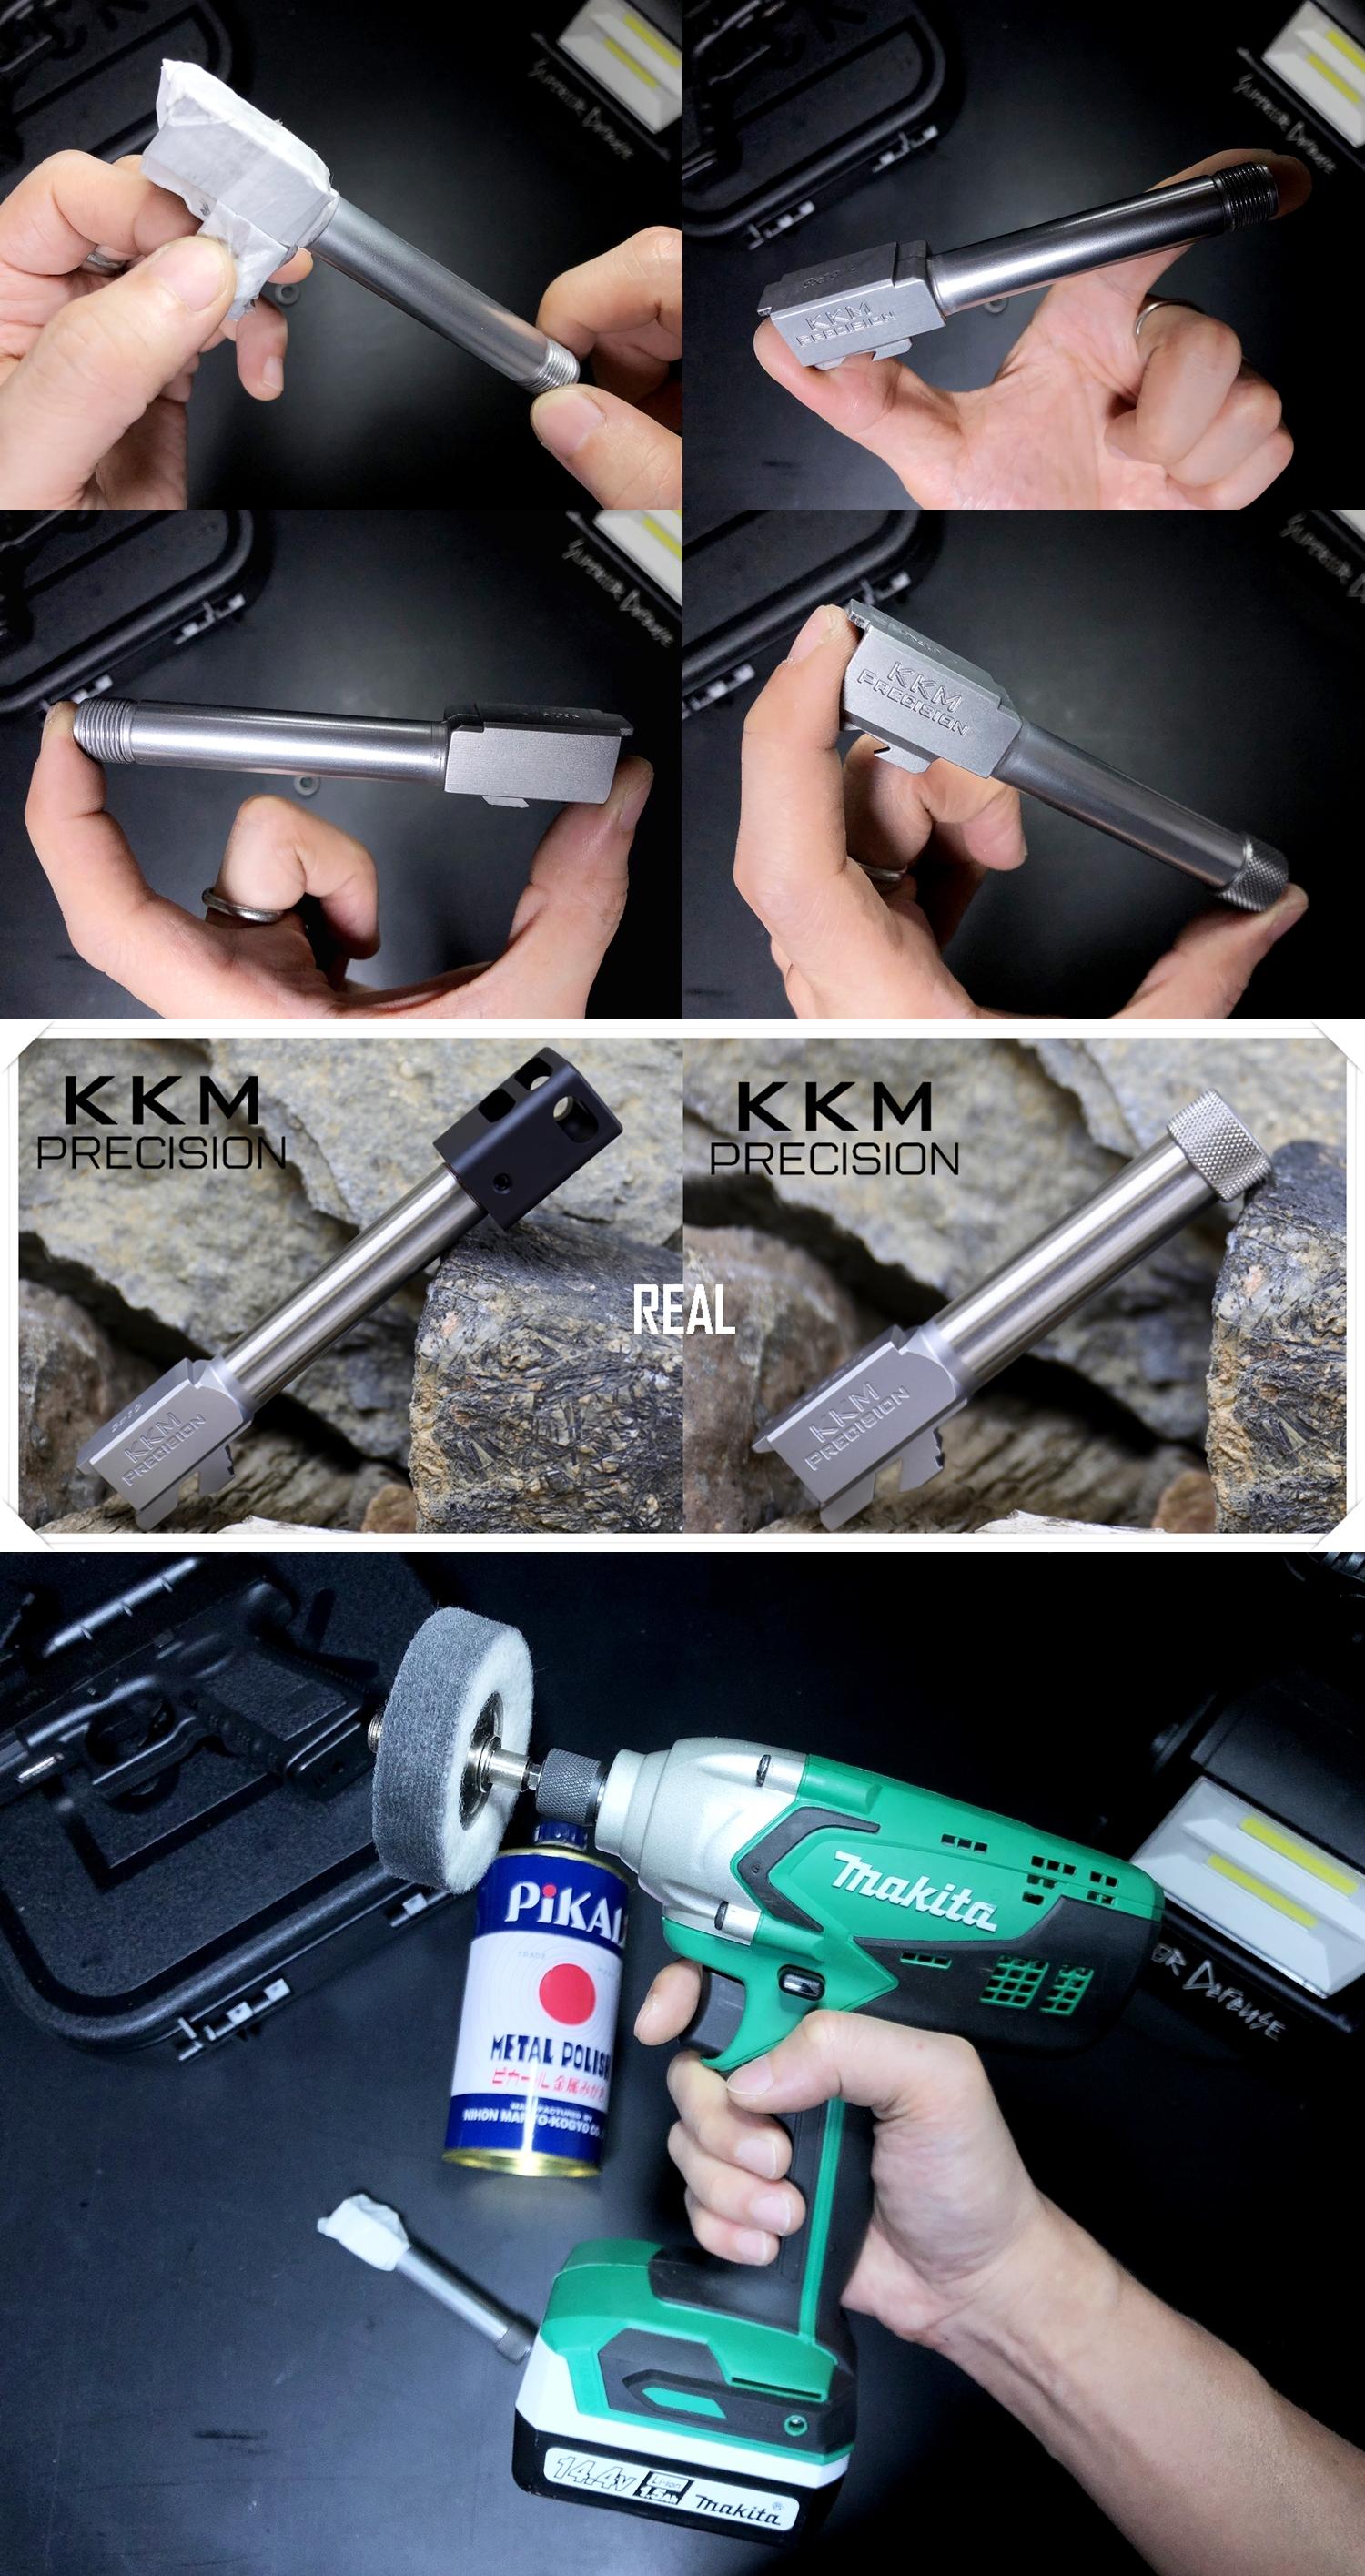 8 KKM MATCH BARREL + PROTECTOR KJ WORKS G19 TYPE & COMPENSATOR β-VERSION HILOG ORIGINAL 3D MOCKUP!! 『SUPDEFG19』自力で作るぞ大作戦!! 最も重要なアウターバレル&コンペンセイターの準備は整った!! DIY サン